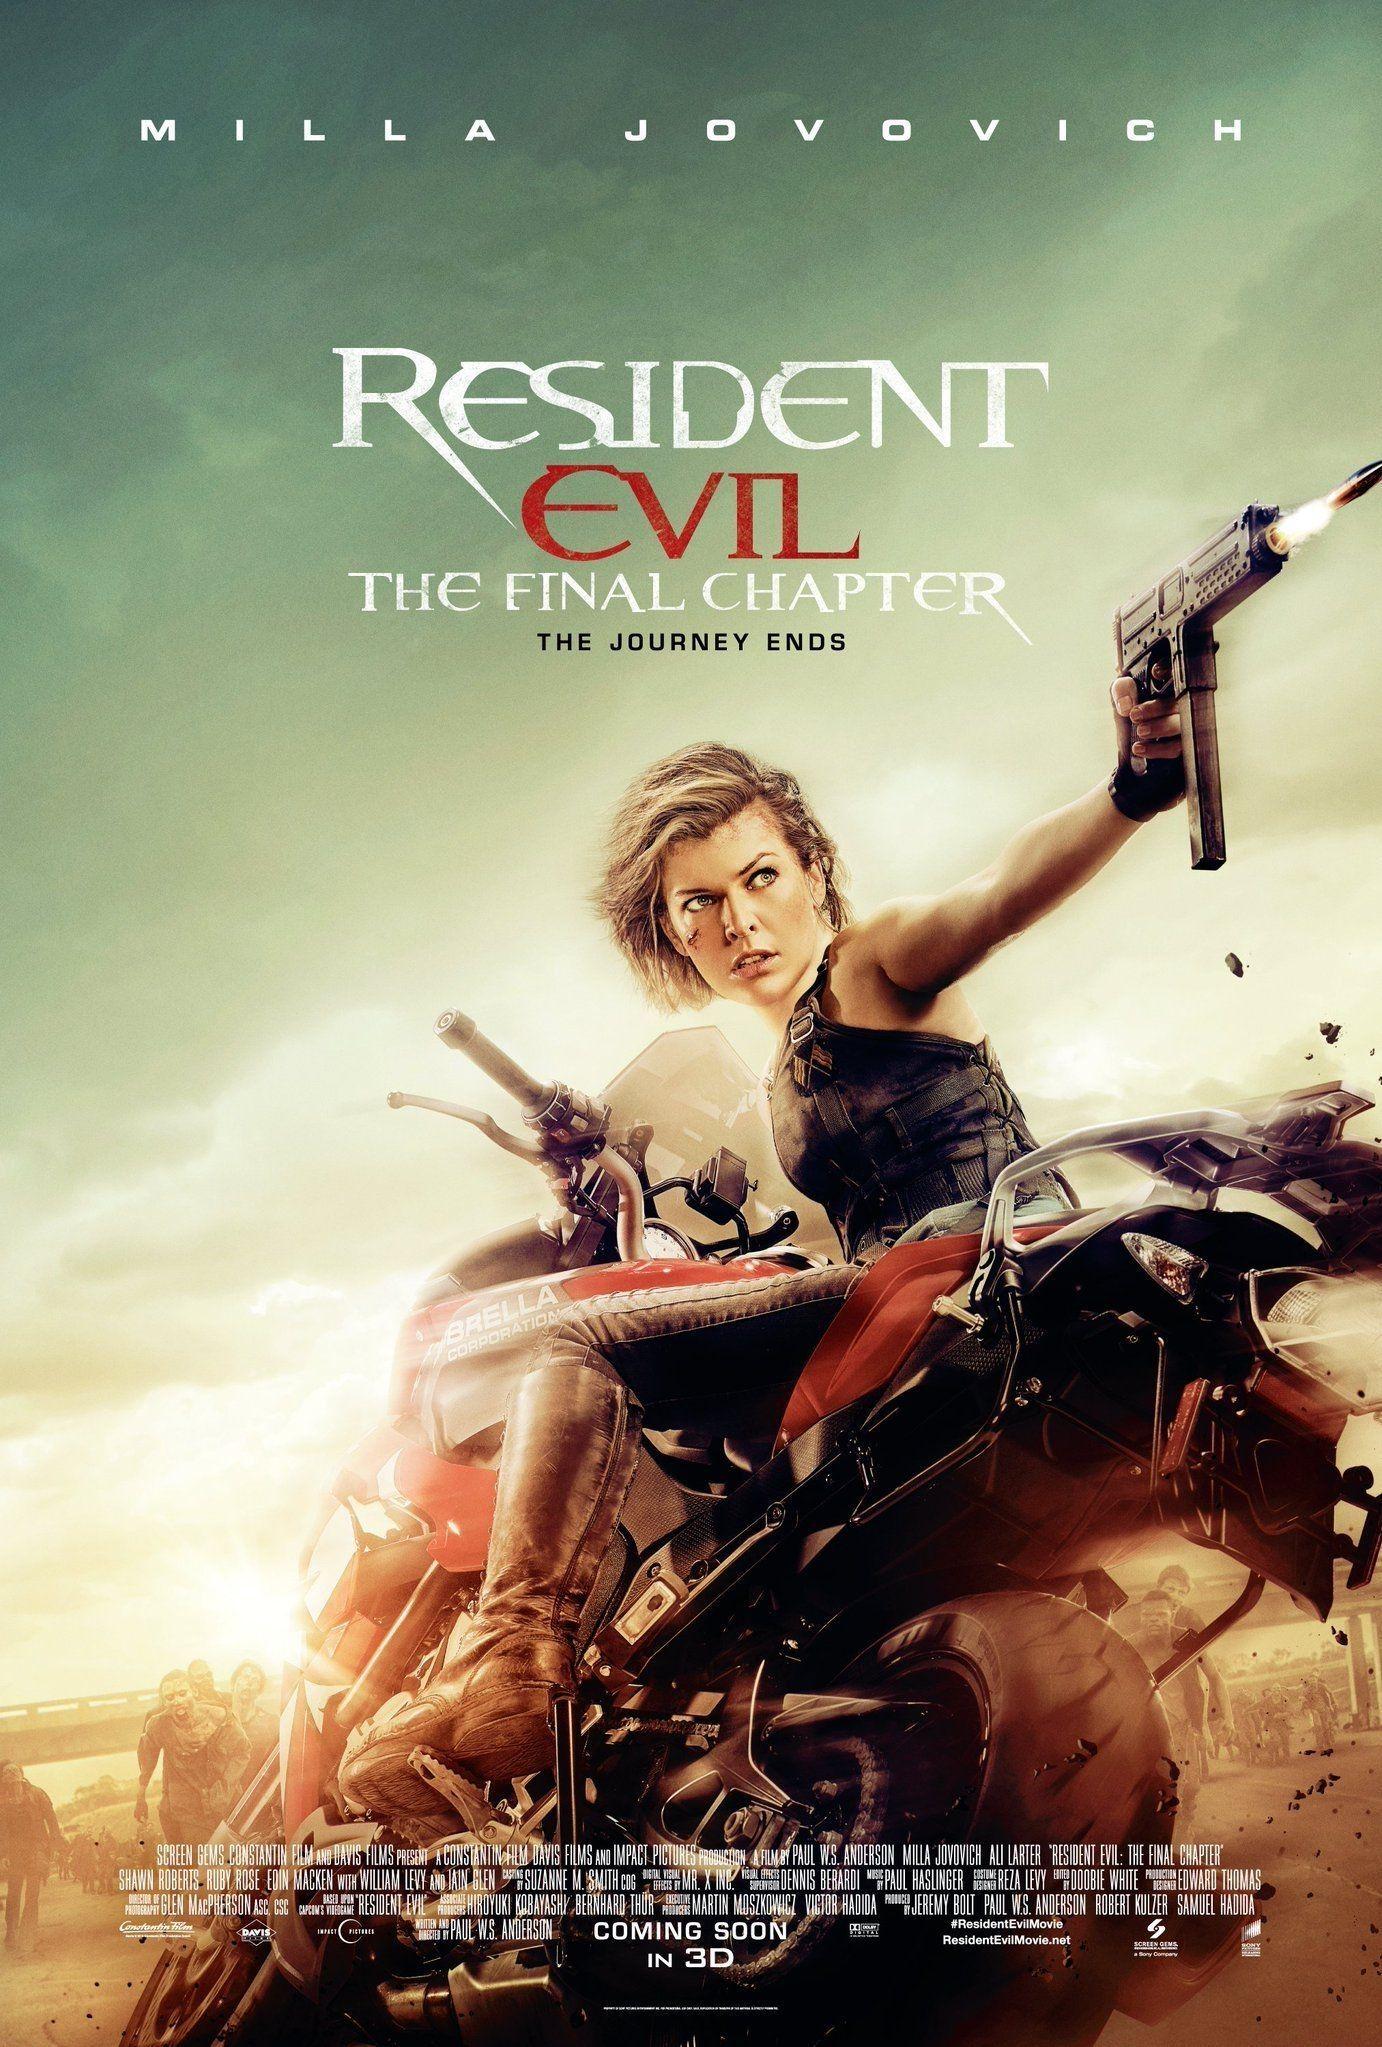 Resident Evil 1 Film Complet Vf Check More At Https Www